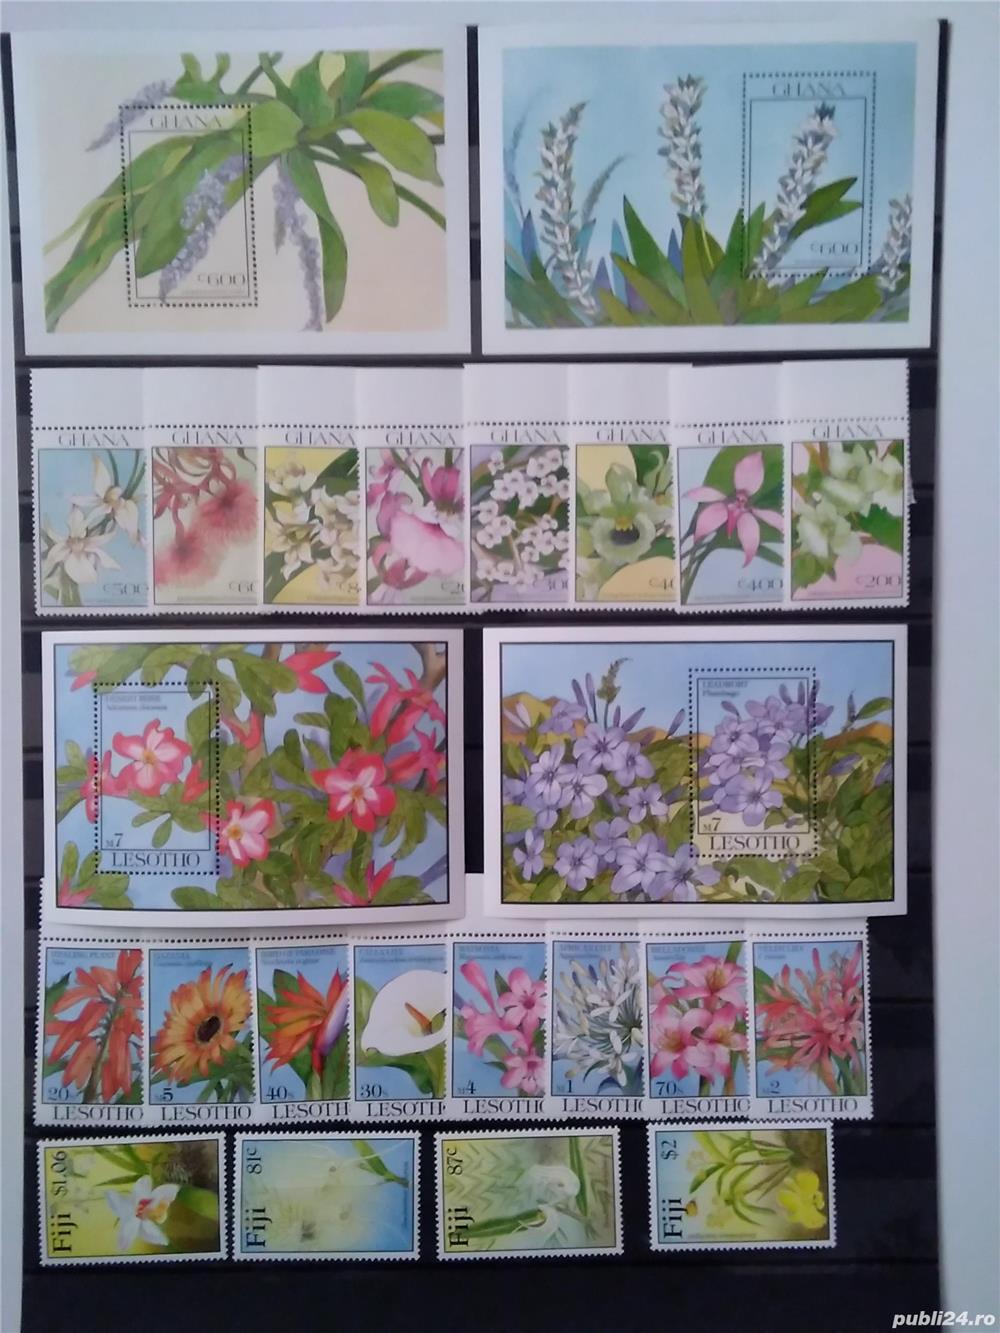 Timbre cu orhidee nestampilate in serii complete